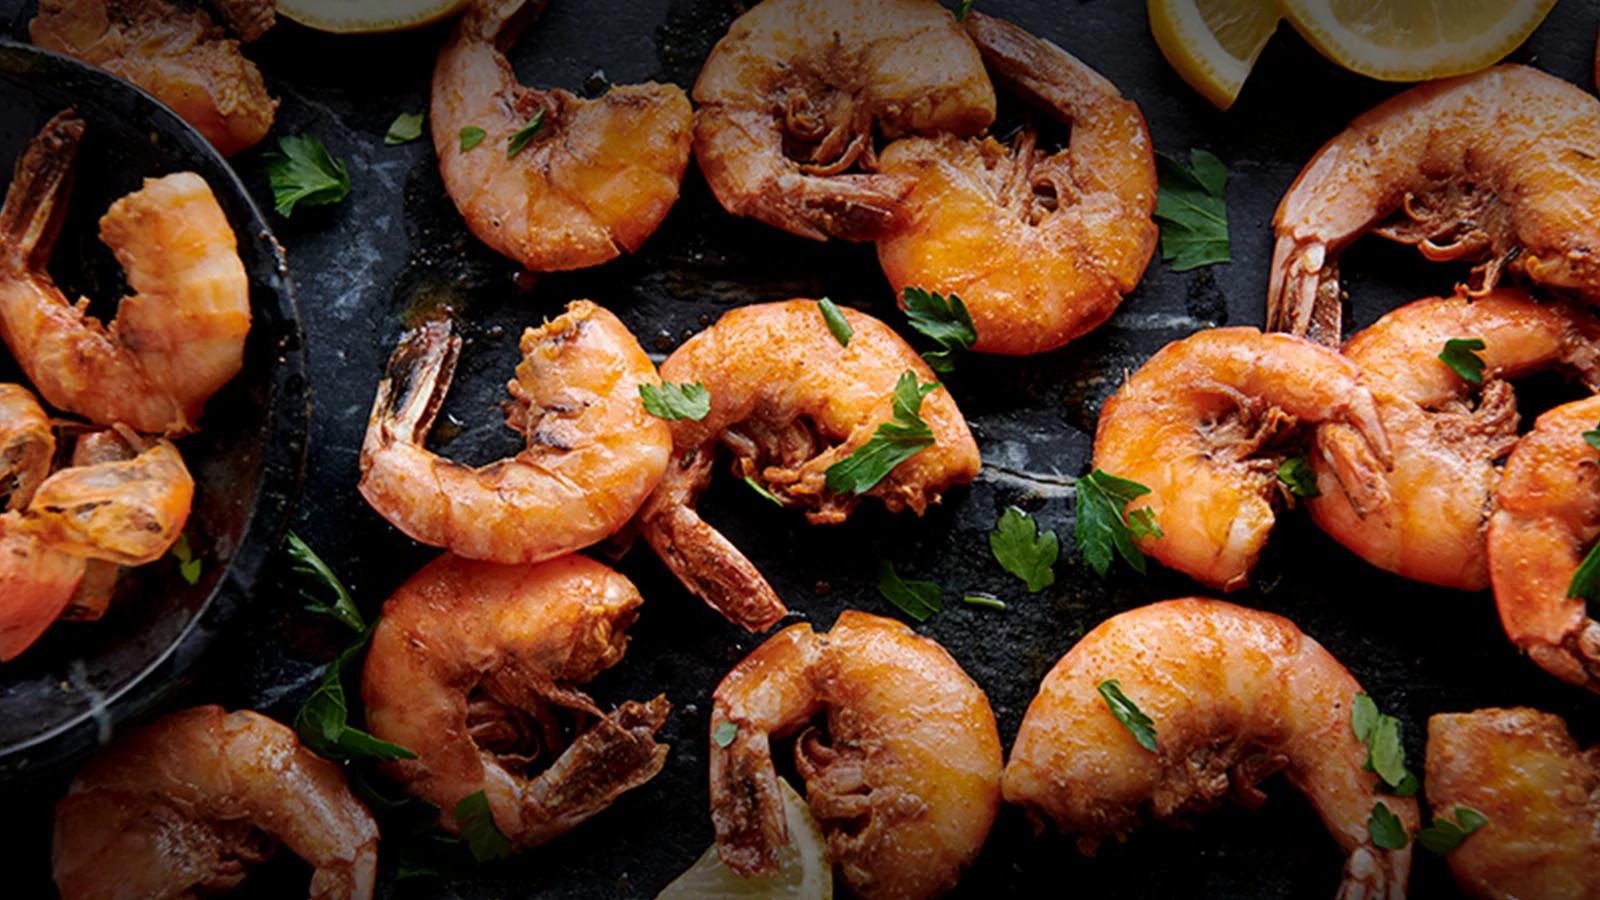 21-25 Per Pound Wild American Shrimp